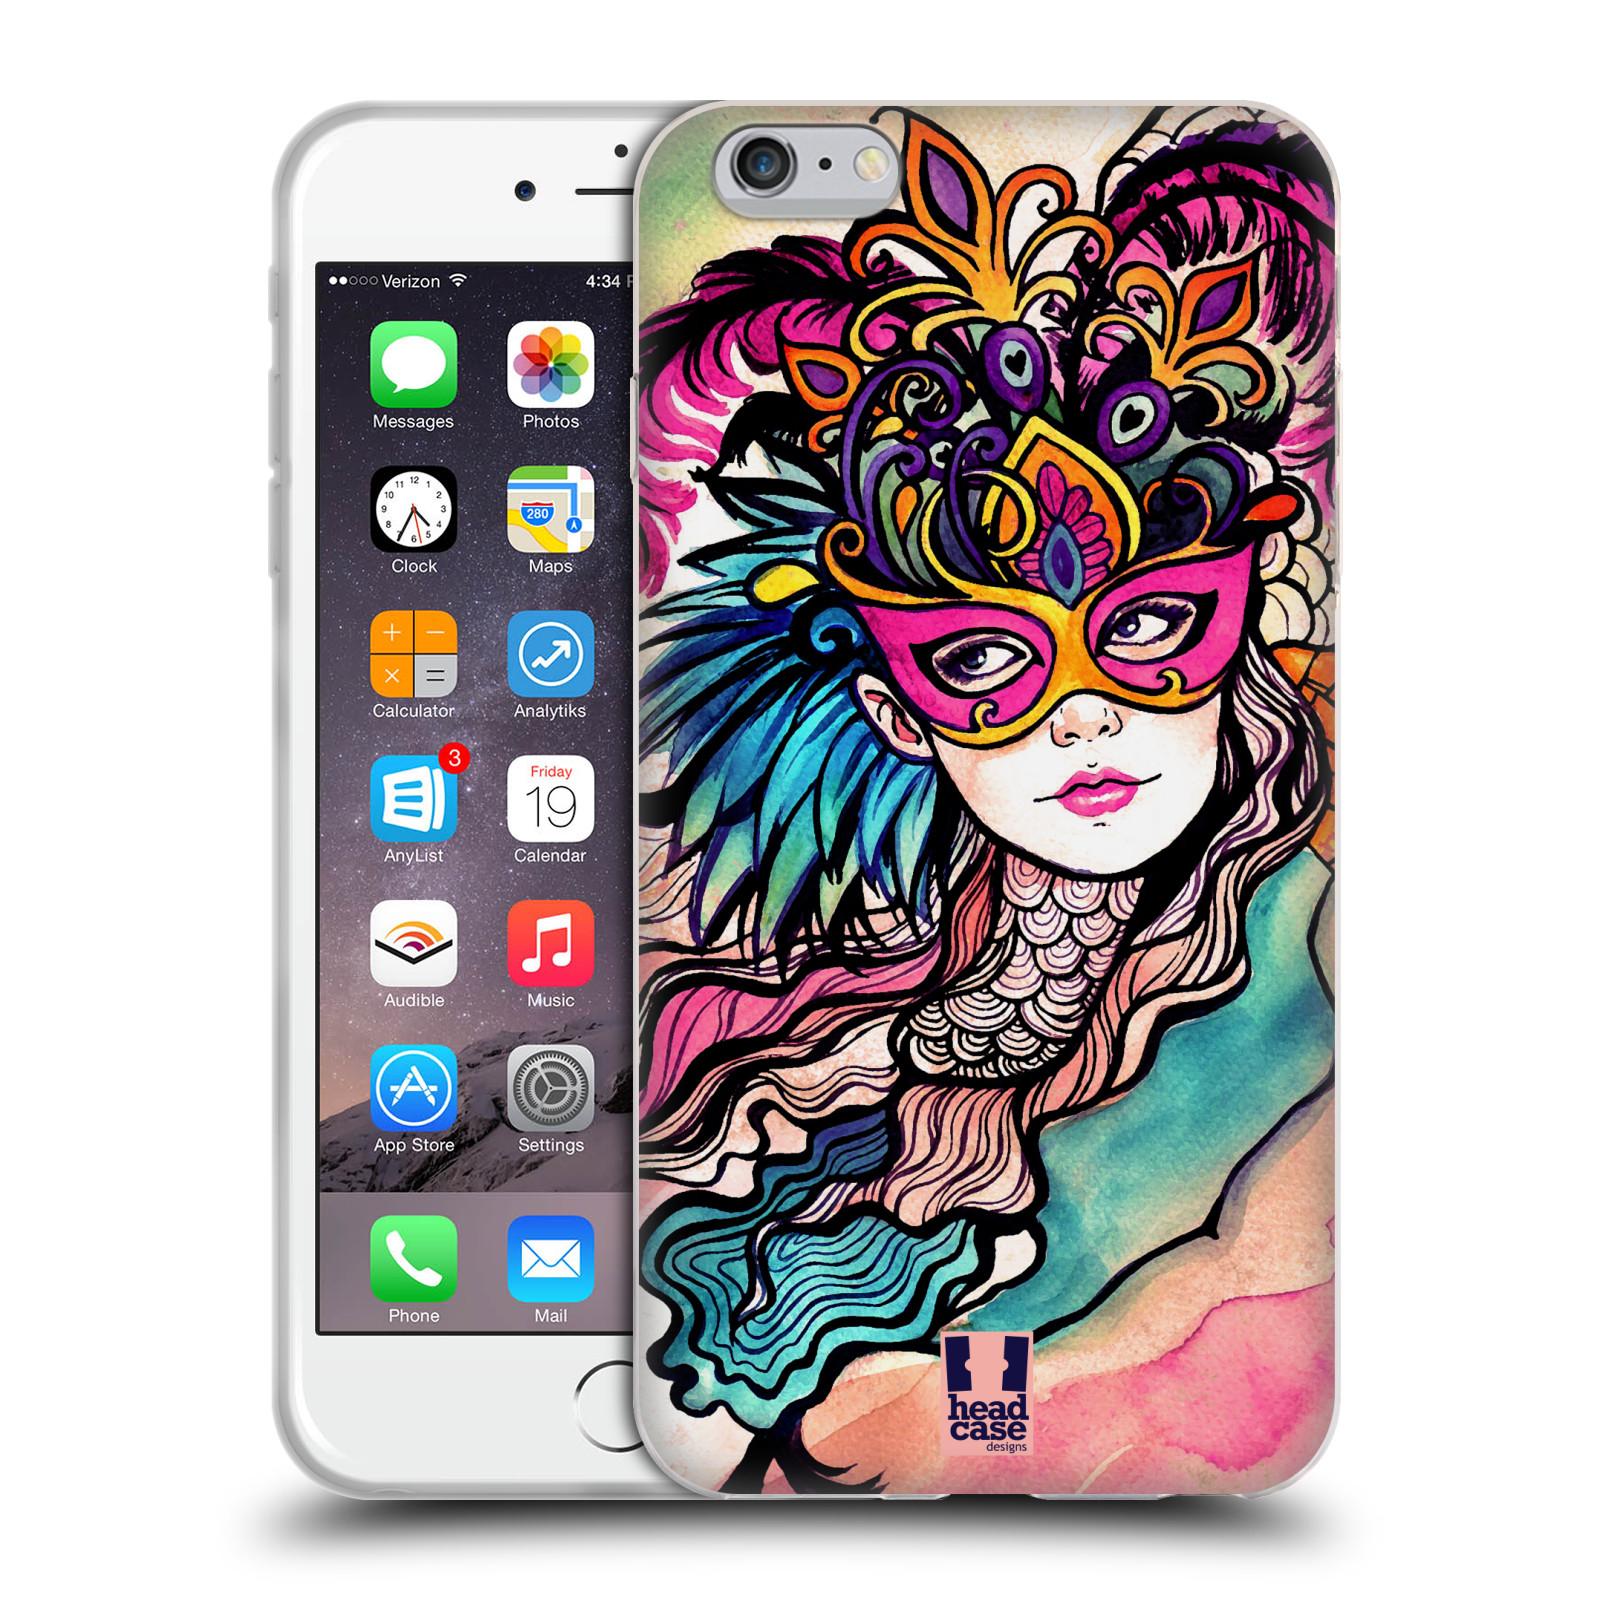 HEAD CASE silikonový obal na mobil Apple Iphone 6 PLUS/ 6S PLUS vzor Maškarní ples masky kreslené vzory růžová